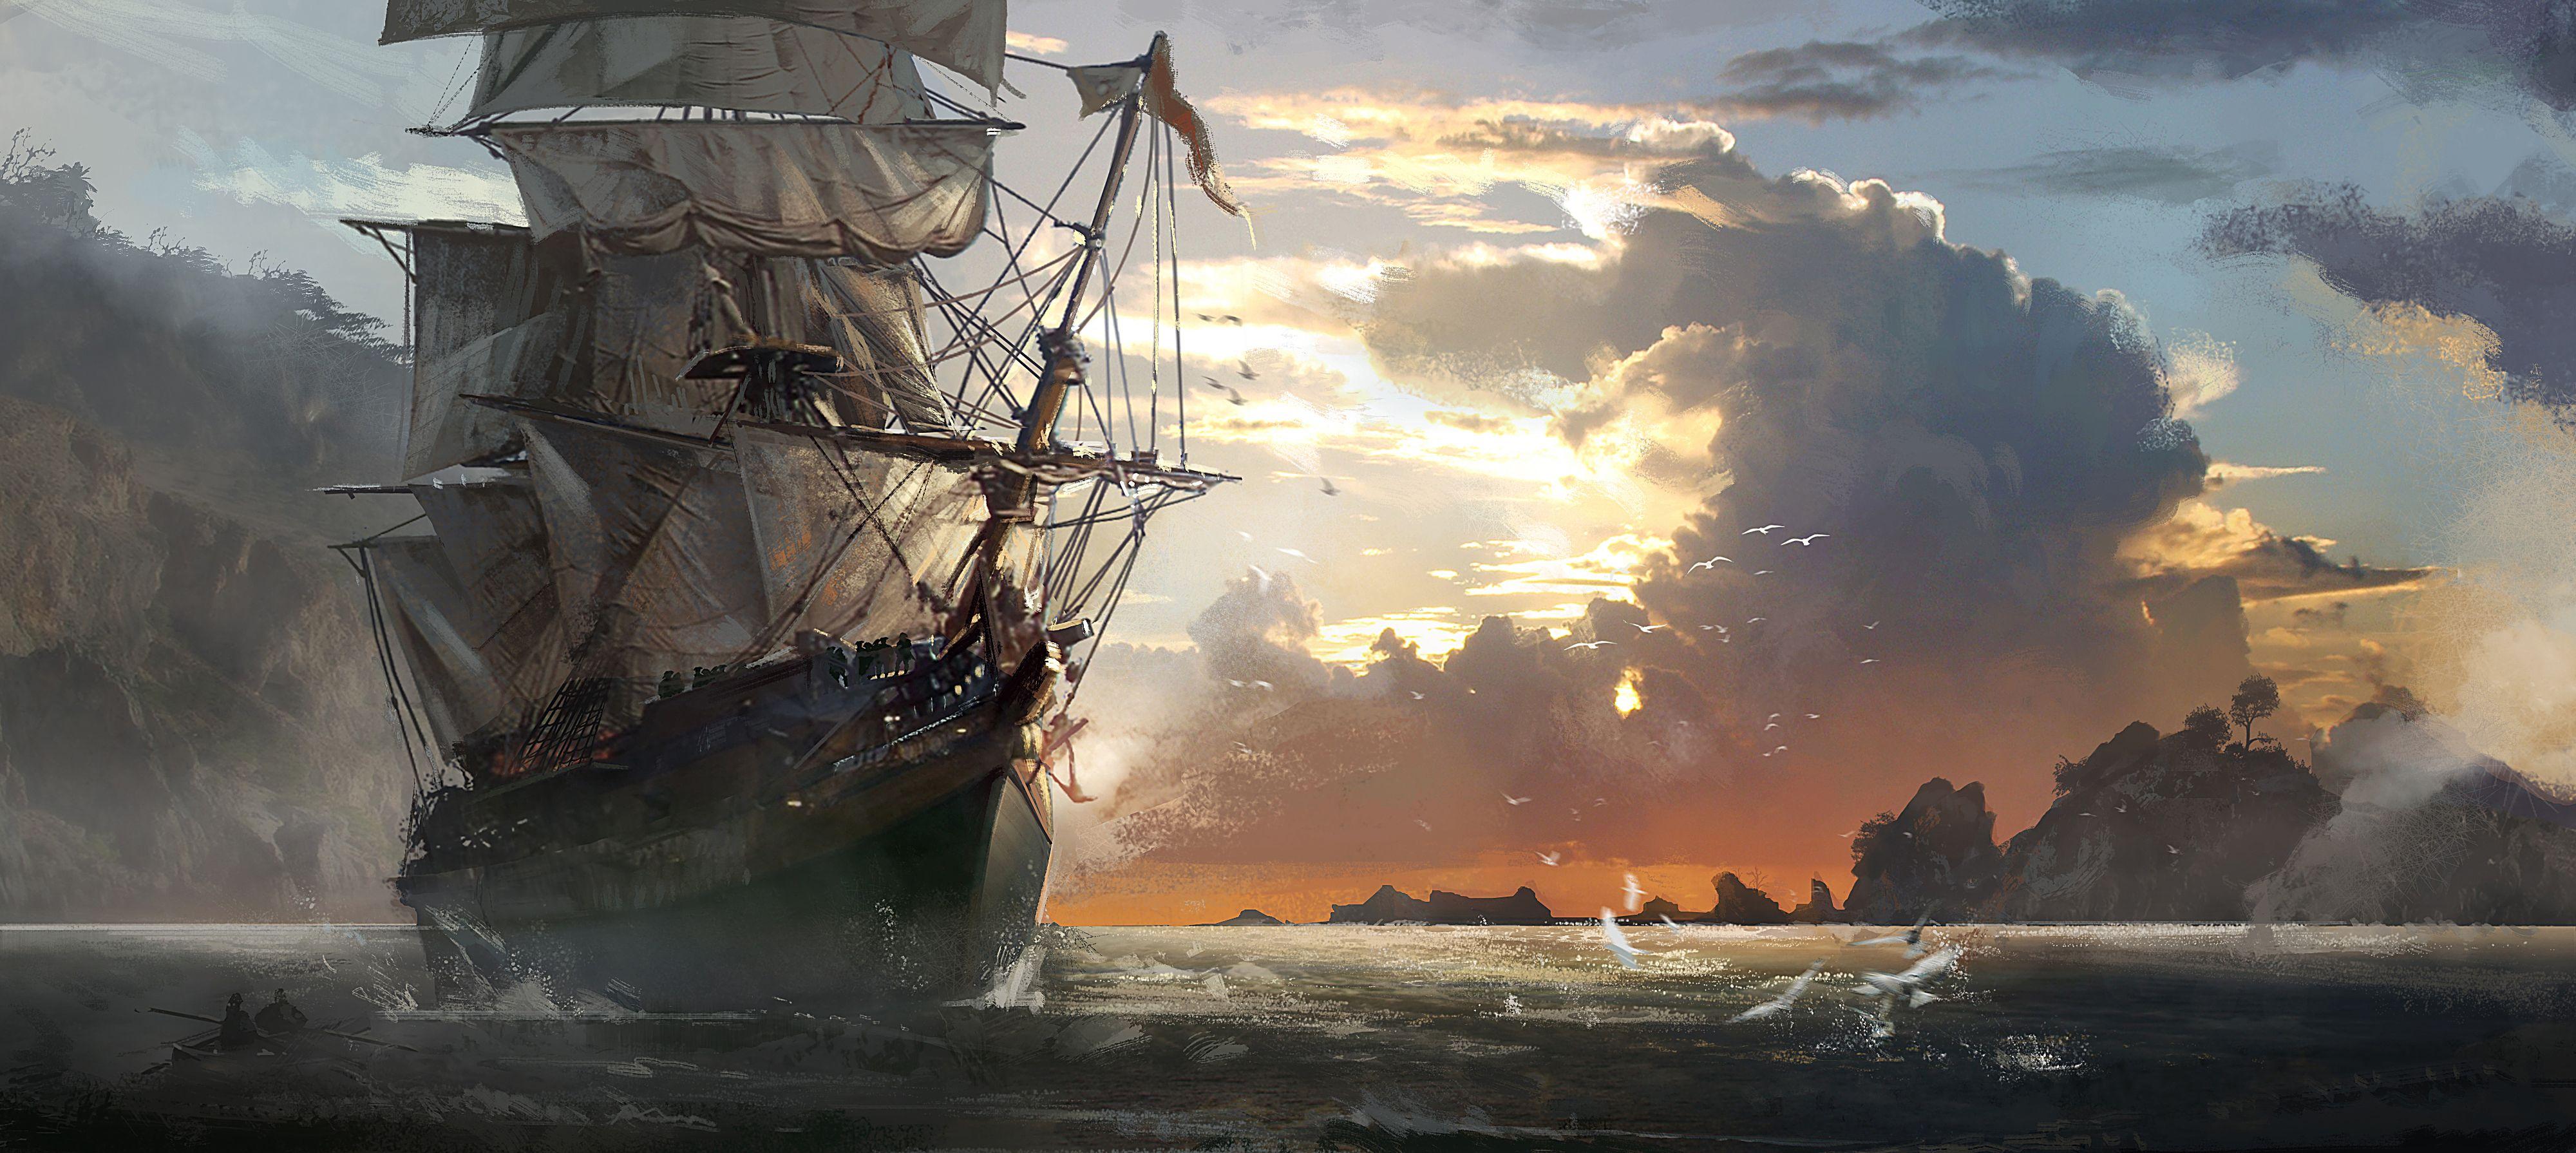 Fantasy ship cliff jolly roger pirate ship rock lightning wallpaper - Sailing Ships